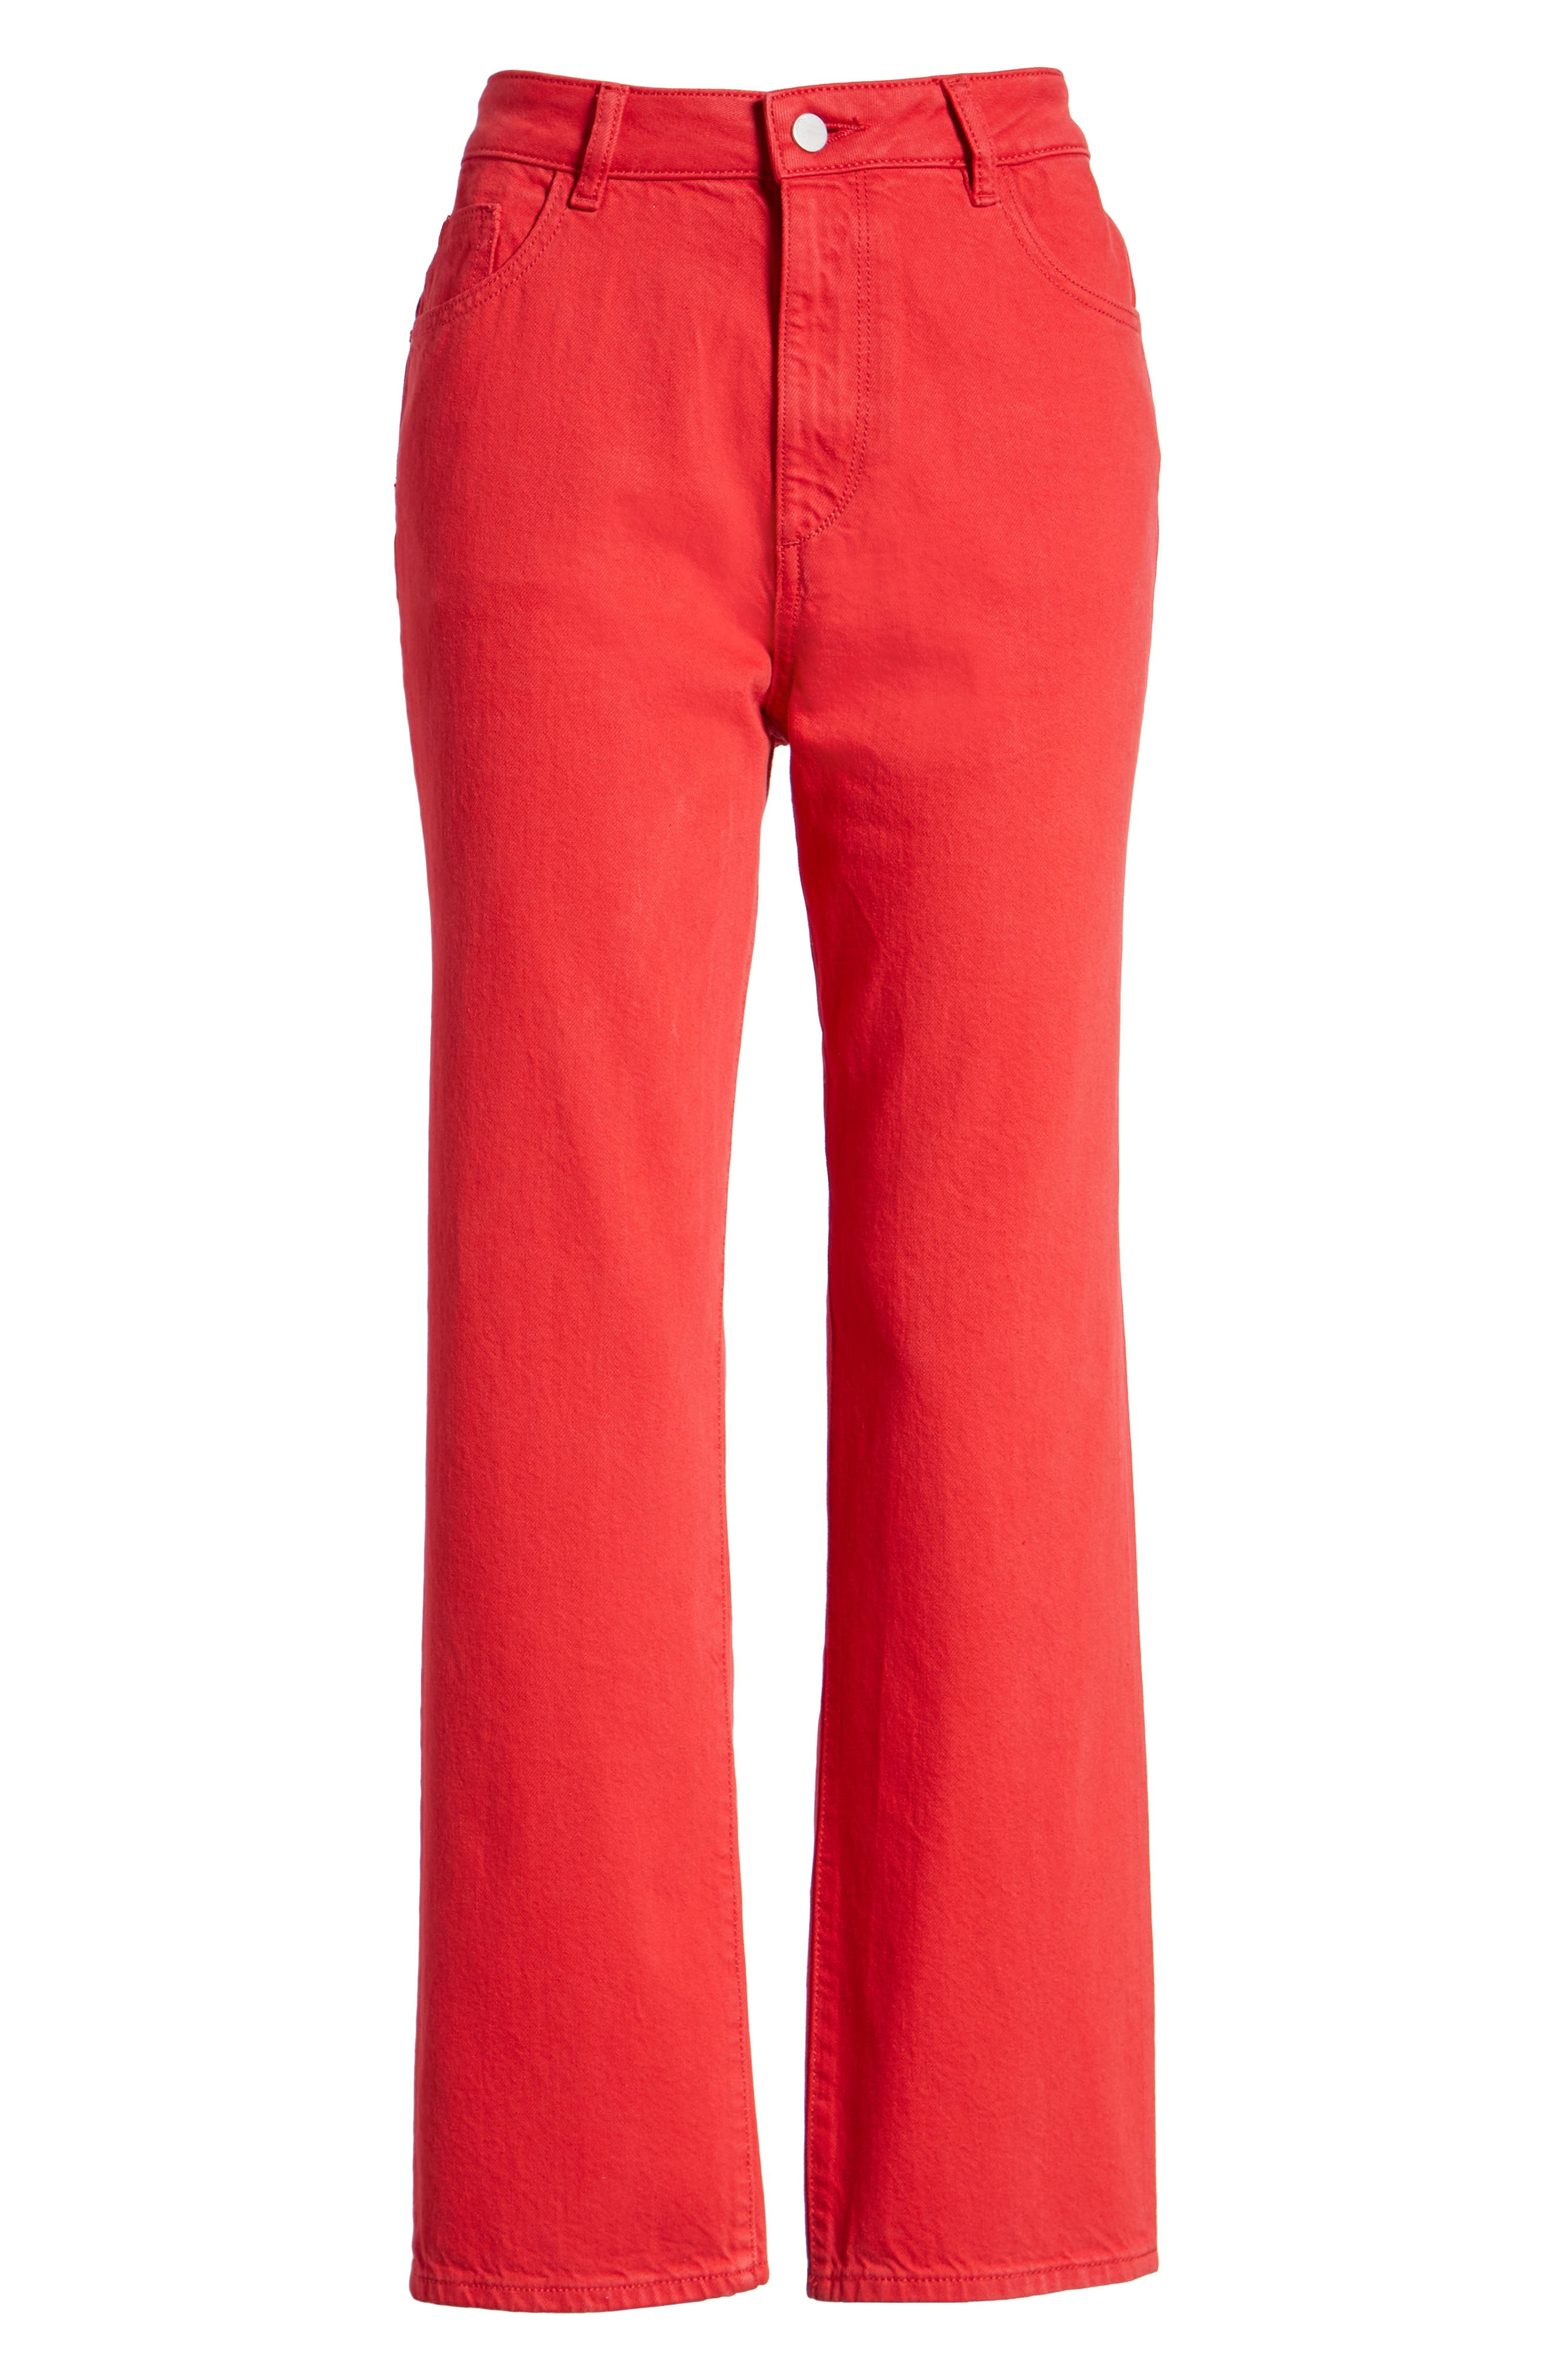 Jerry High Waist Straight Leg Jeans,                             Alternate thumbnail 7, color,                             600